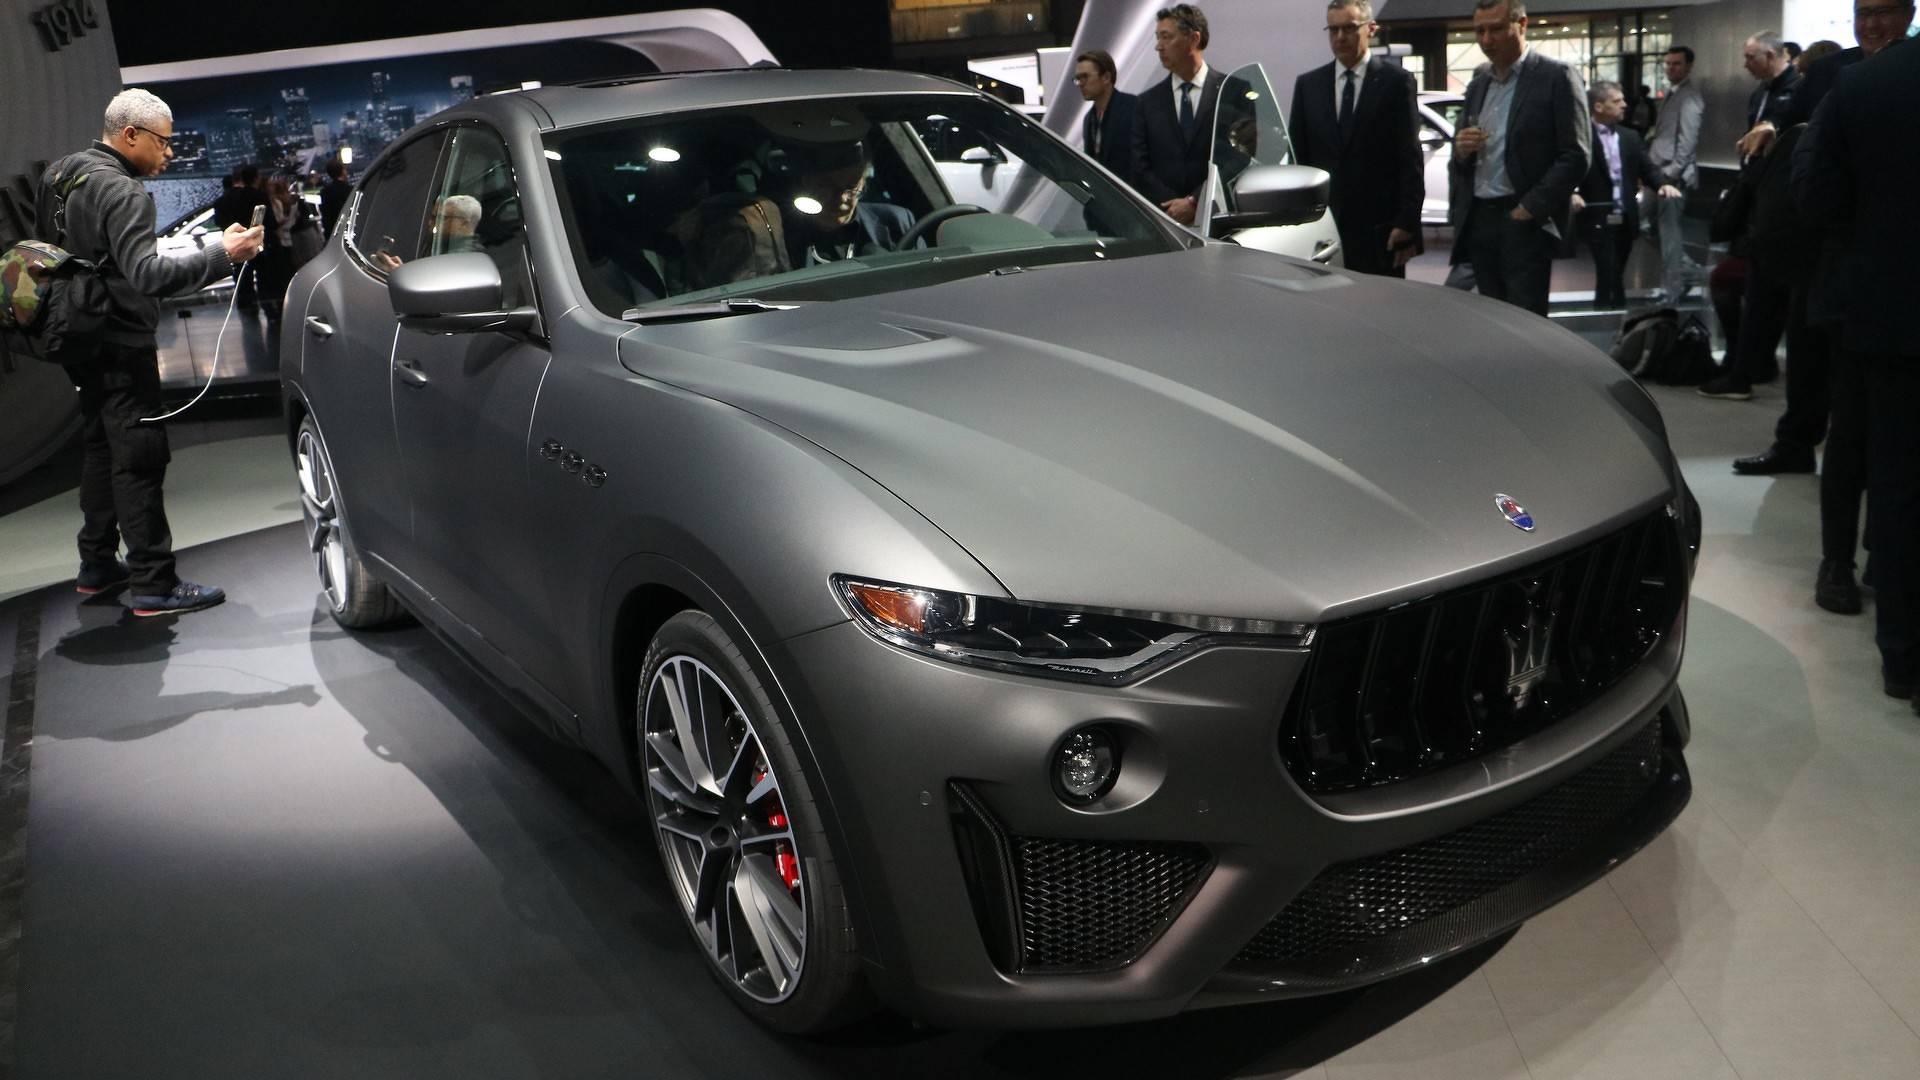 2019 Maserati Levante Trofeo Review >> Maserati Levante Trofeo Storms New York With 590 Hp V8